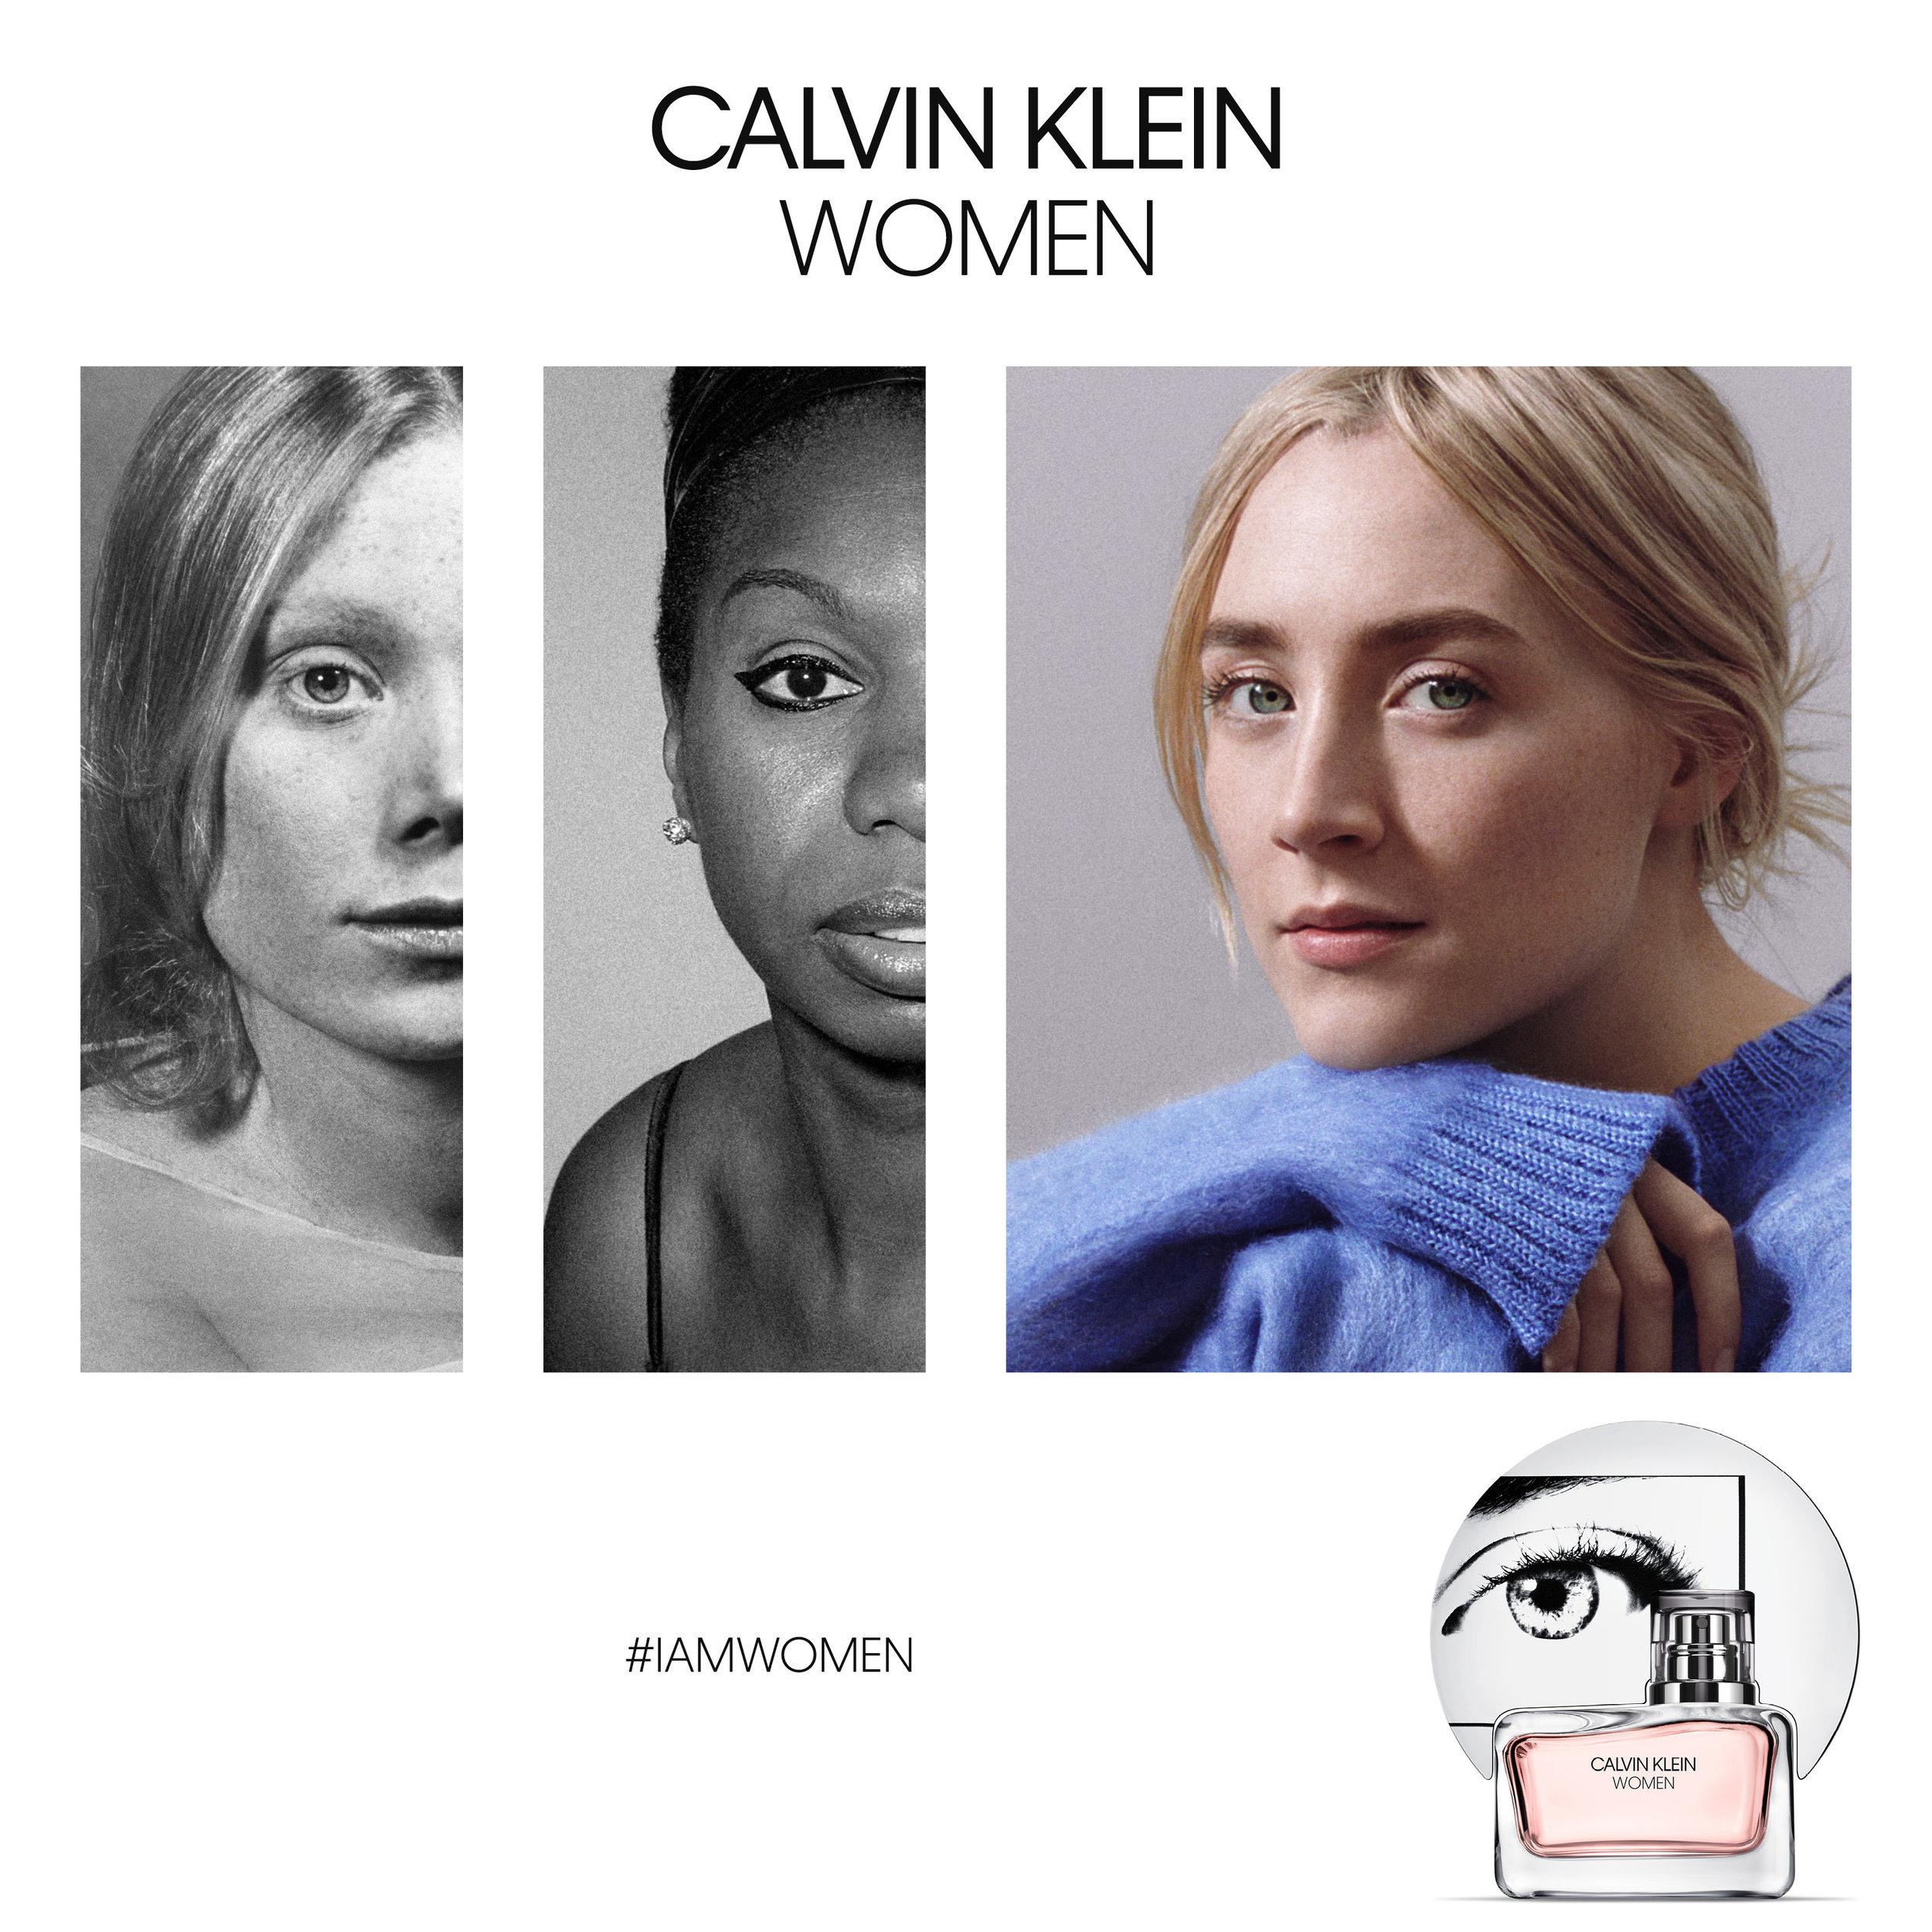 CK_Woman_Model_Saoirse.jpg